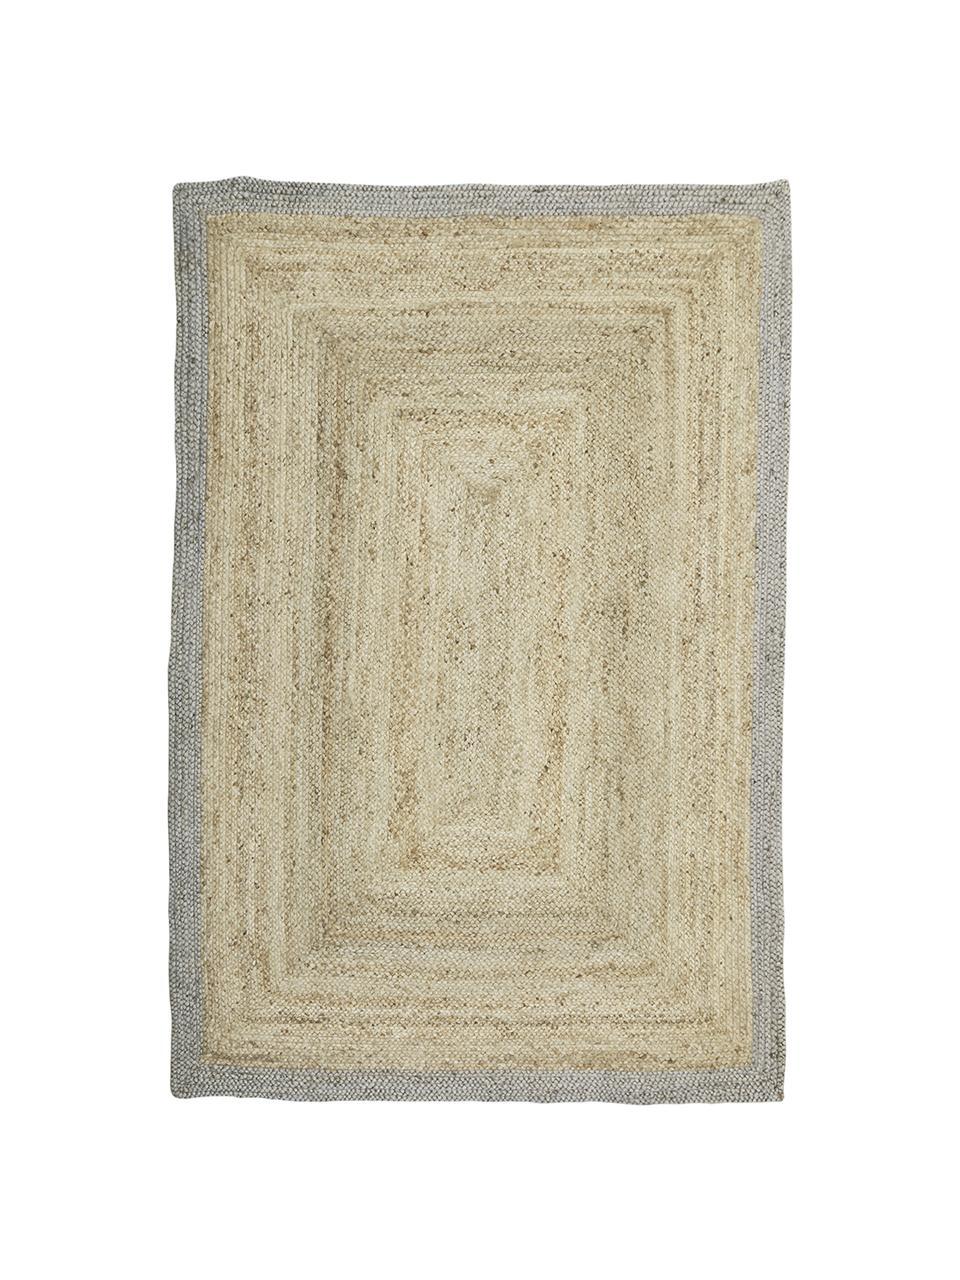 Handgefertigter Jute-Teppich Shanta mit grauem Rand, Beige, Grau, B 160 x L 230 cm (Größe M)